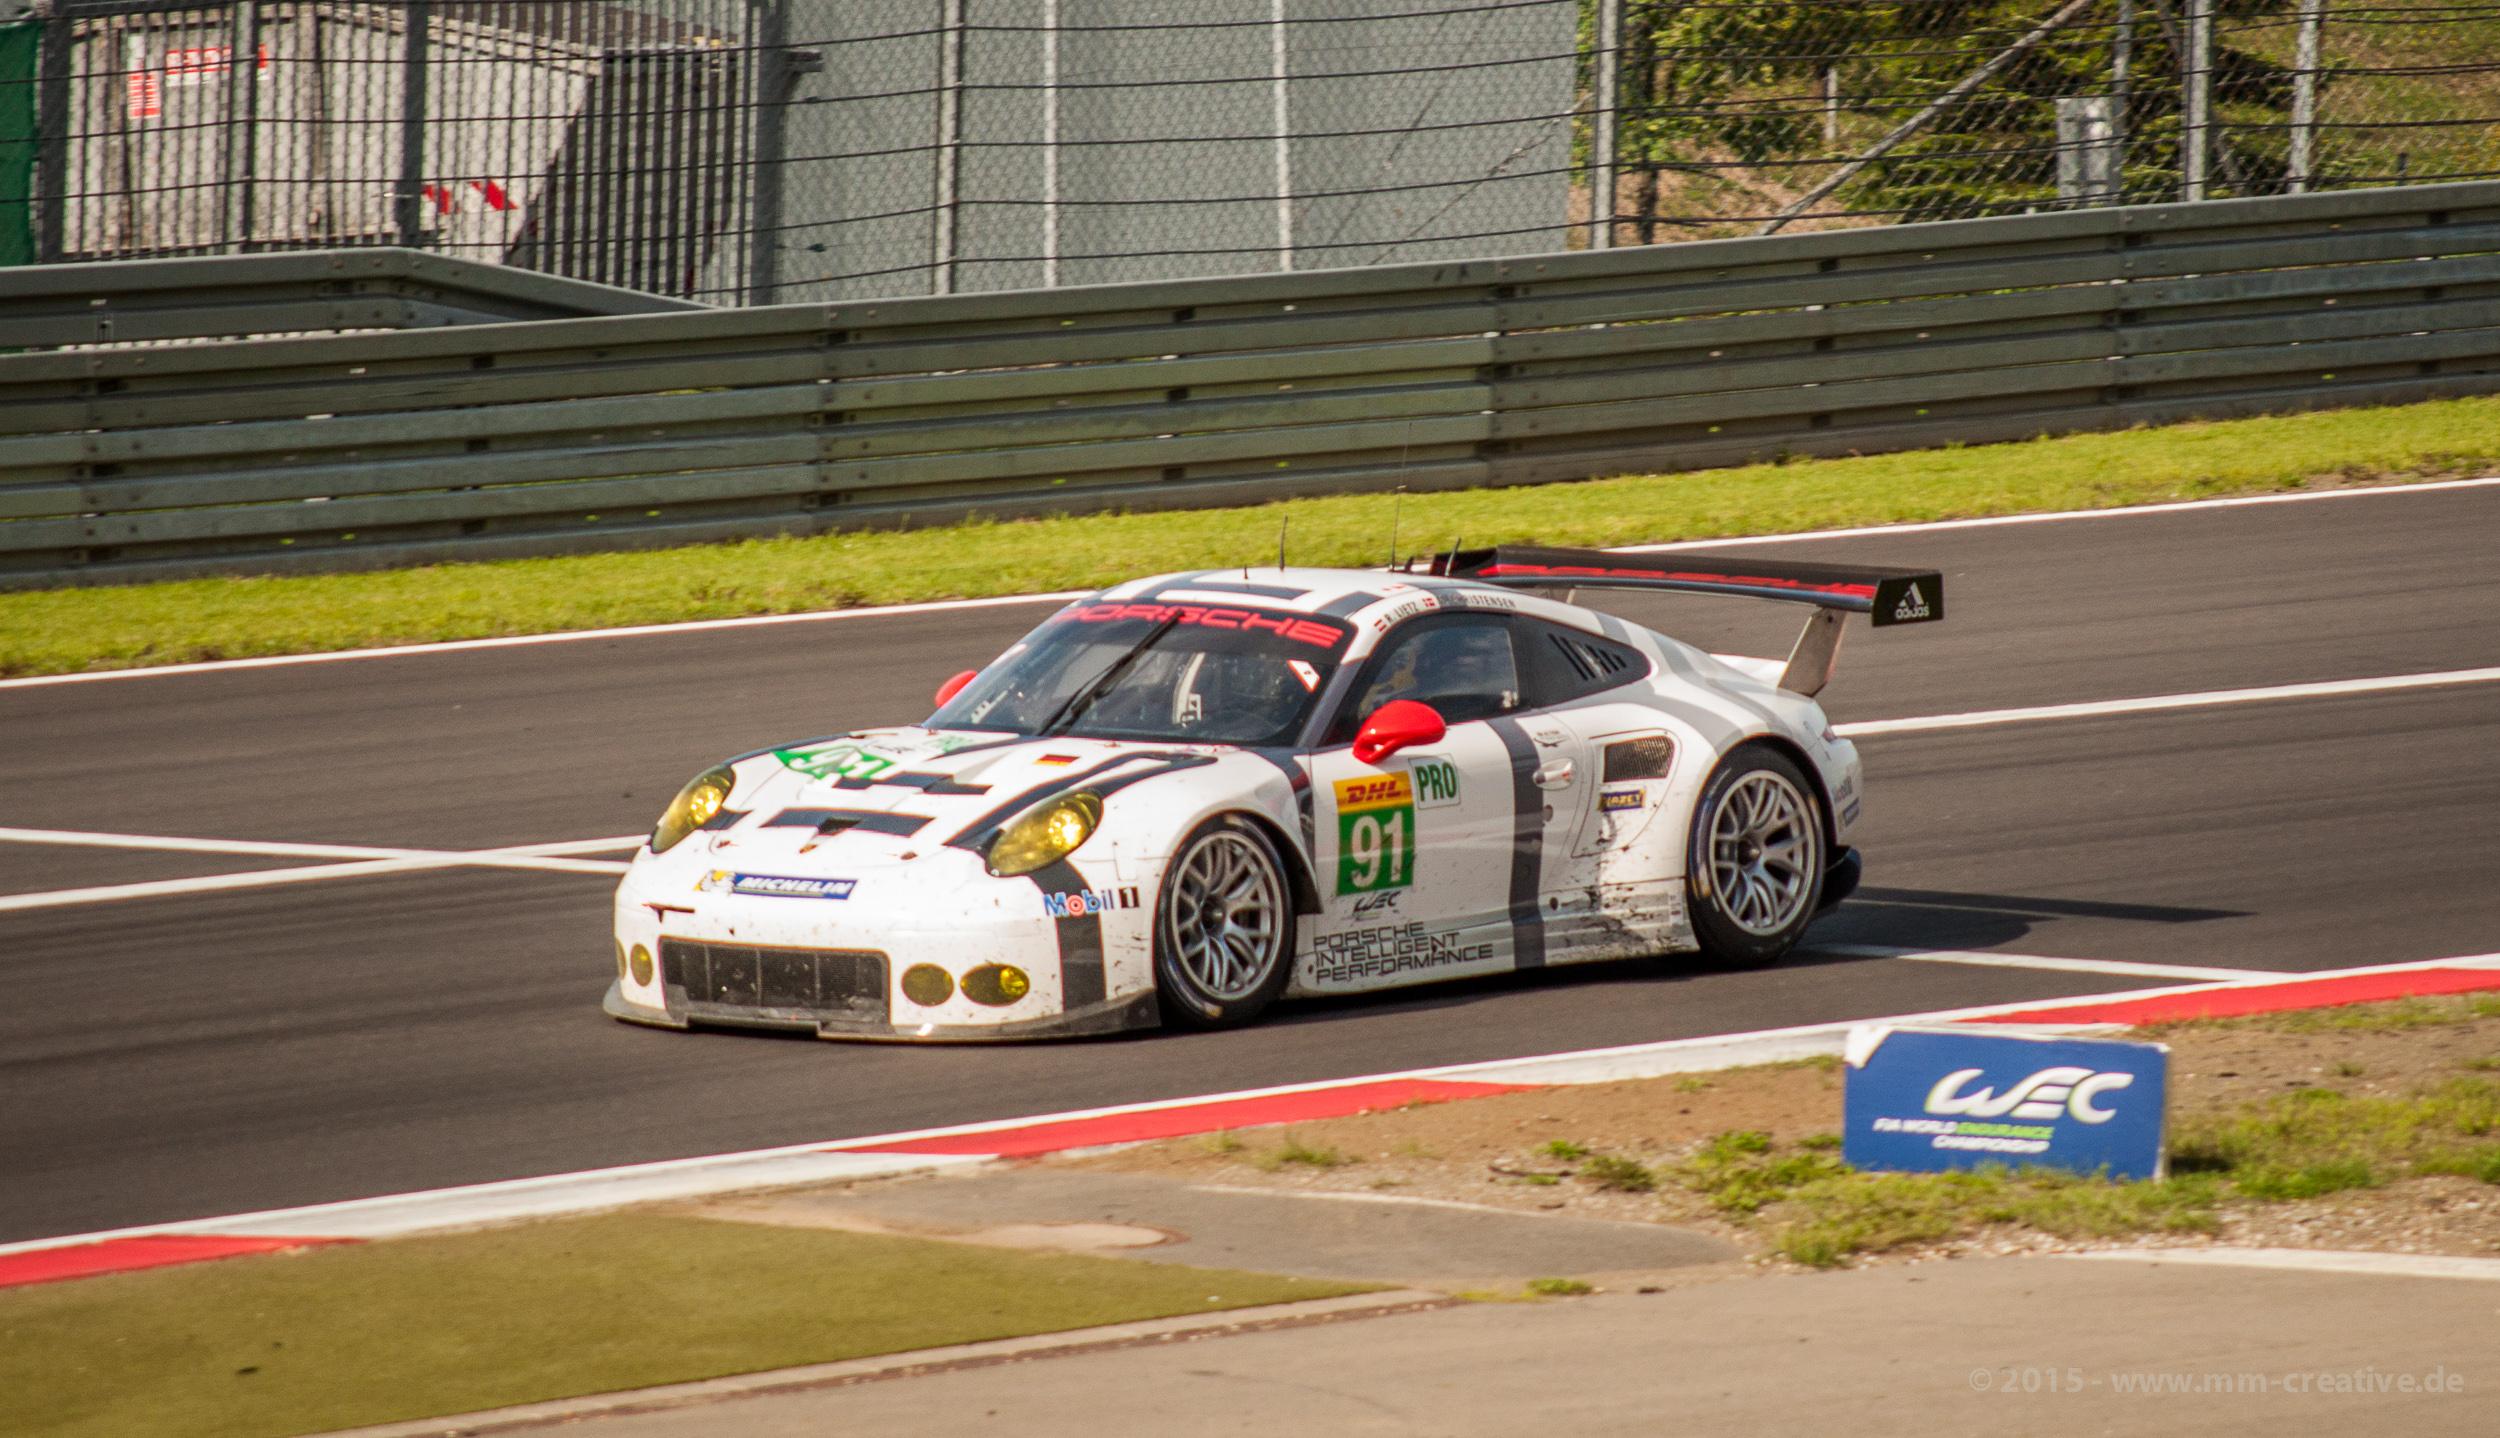 Manthey Racing WEC 2015 am Nürburgring